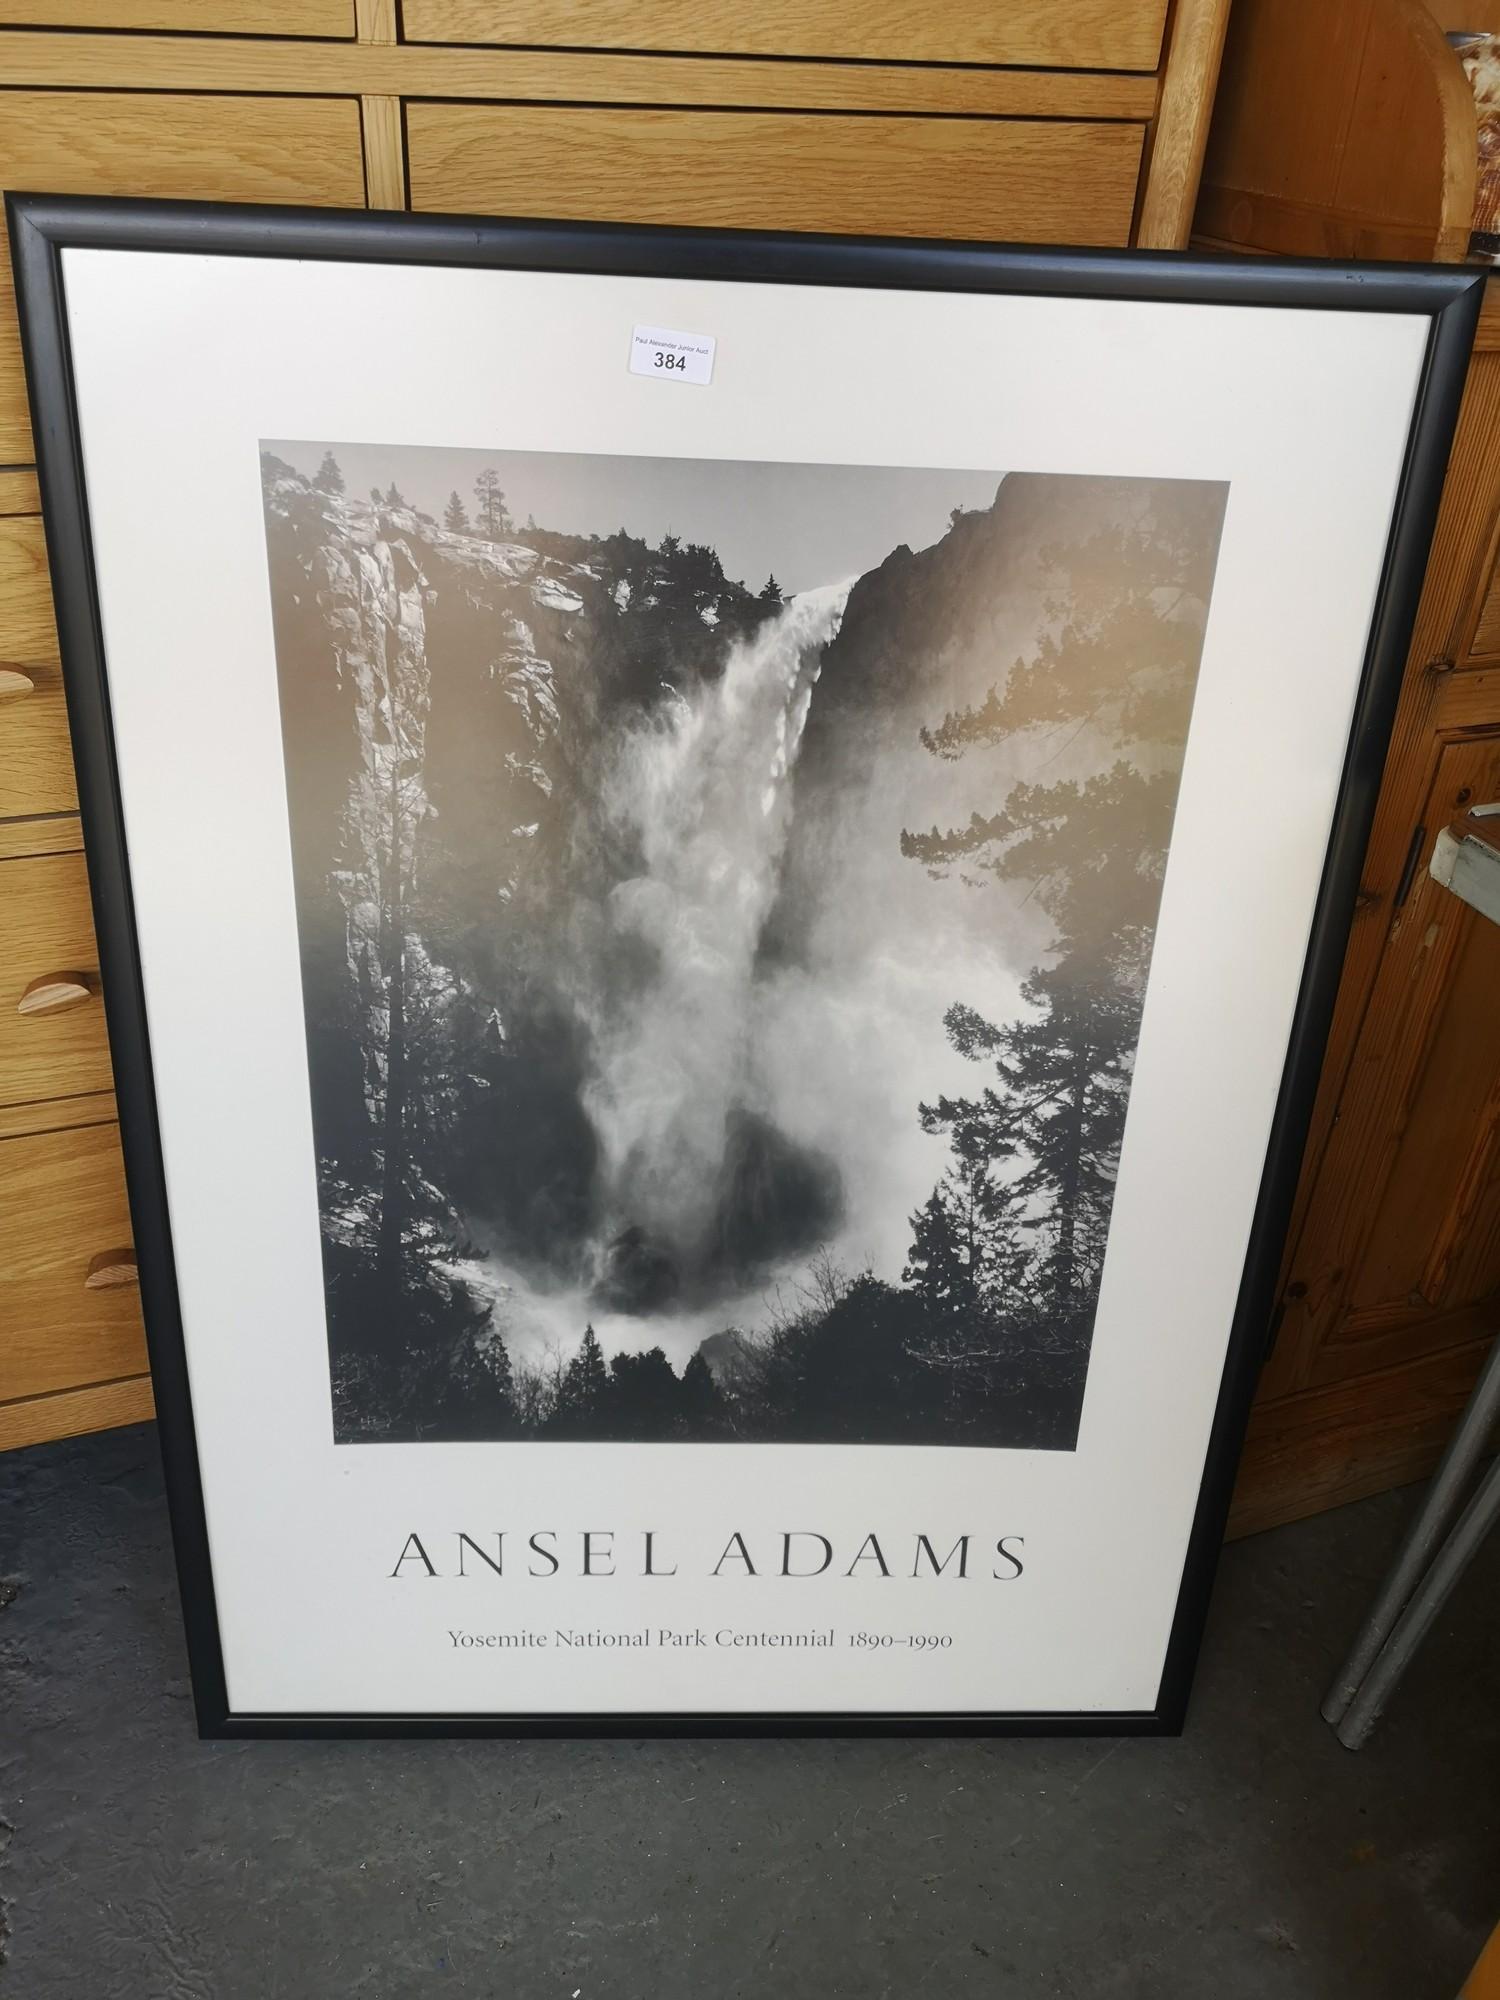 Ansel Adams print in frame.